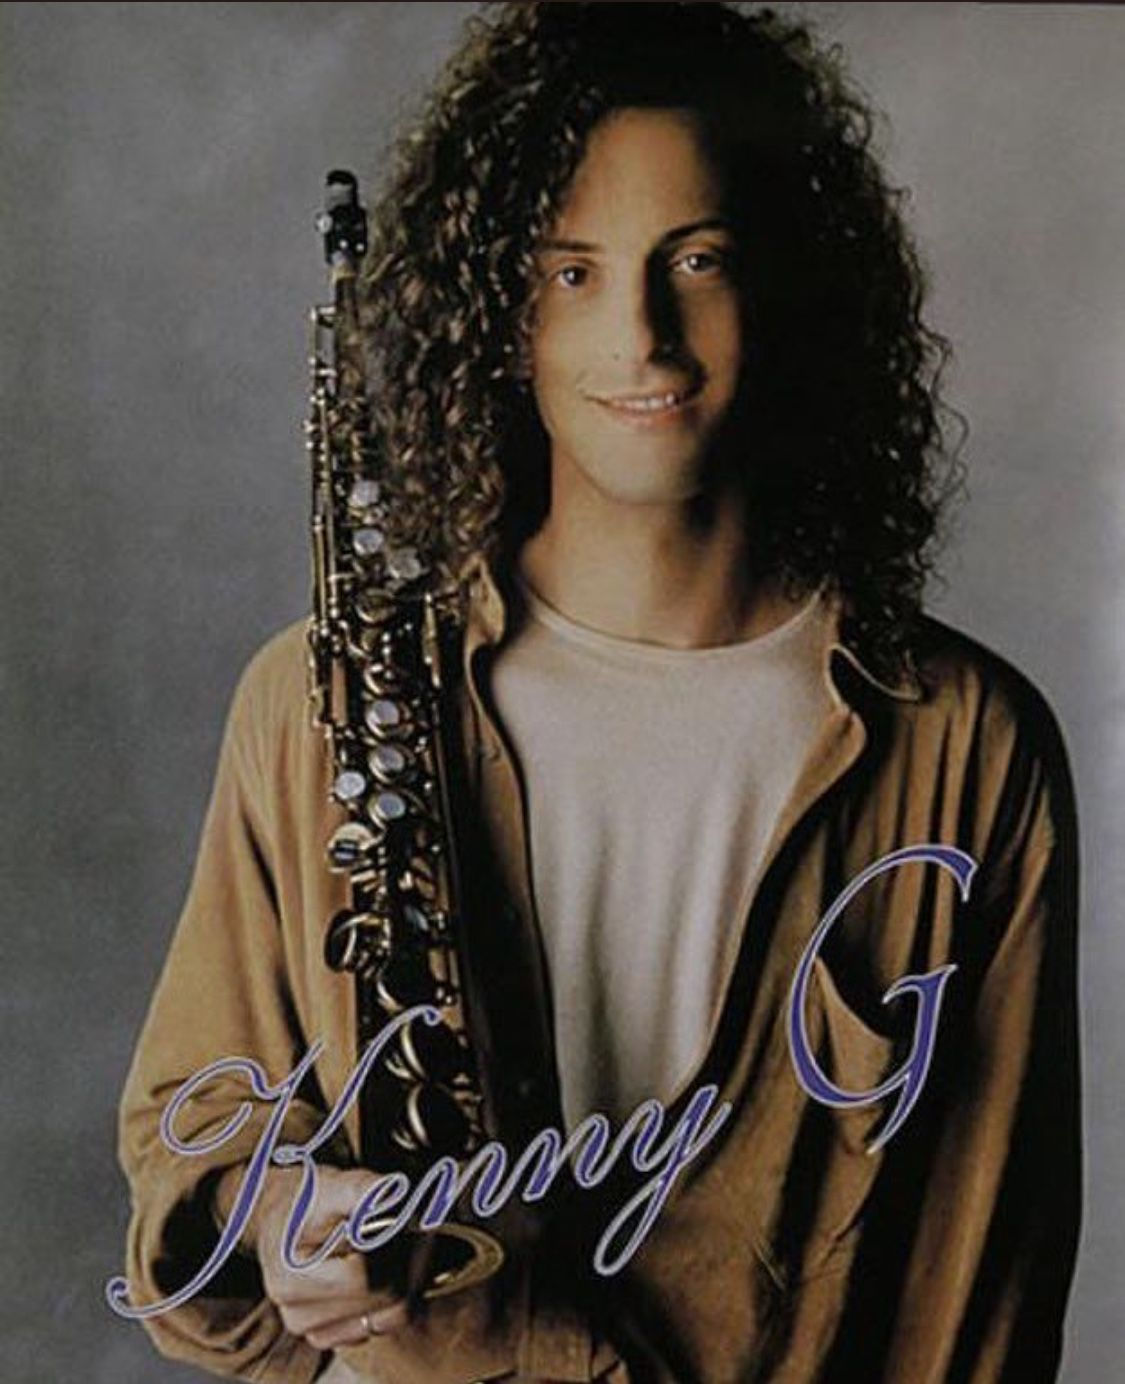 Baby Kenny G Kenny G Hair Styles Beauty